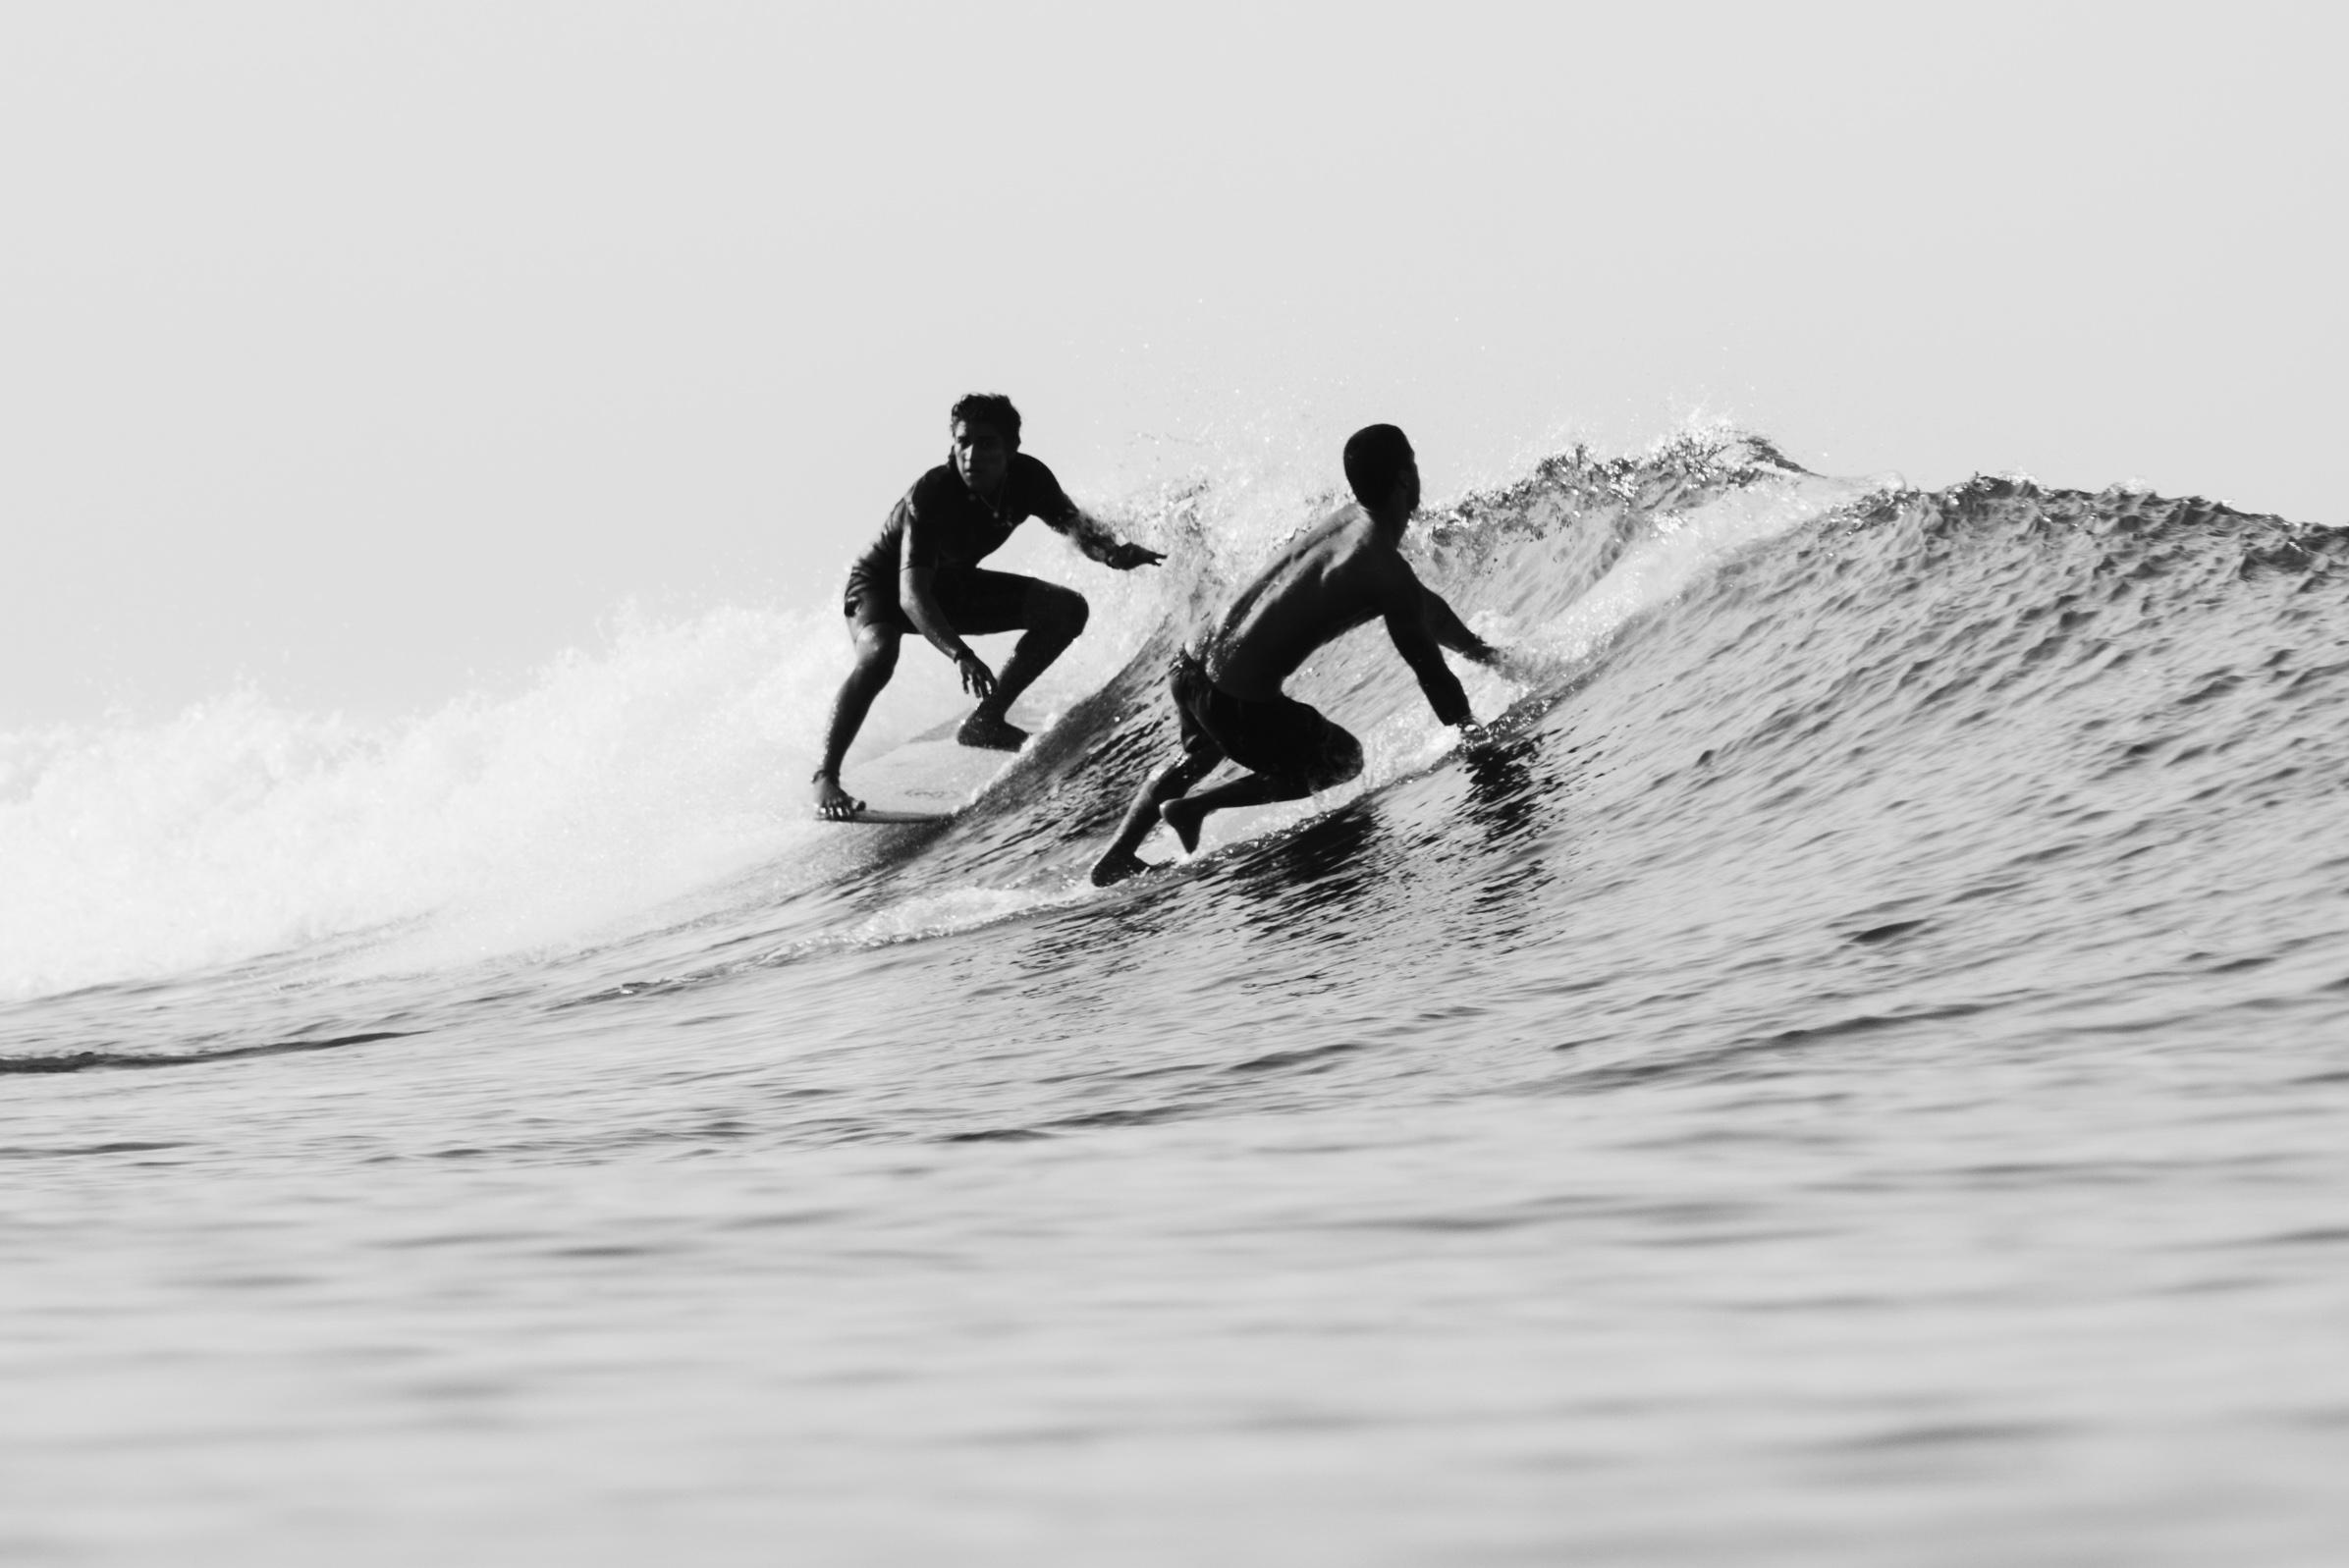 Surf-Mexico-Zihuatanejo-Sayulita-Ixtapa-Zihuatanejo-Diego-Cadena-Olas-Fotografia-Heiko-Bothe-10.jpg